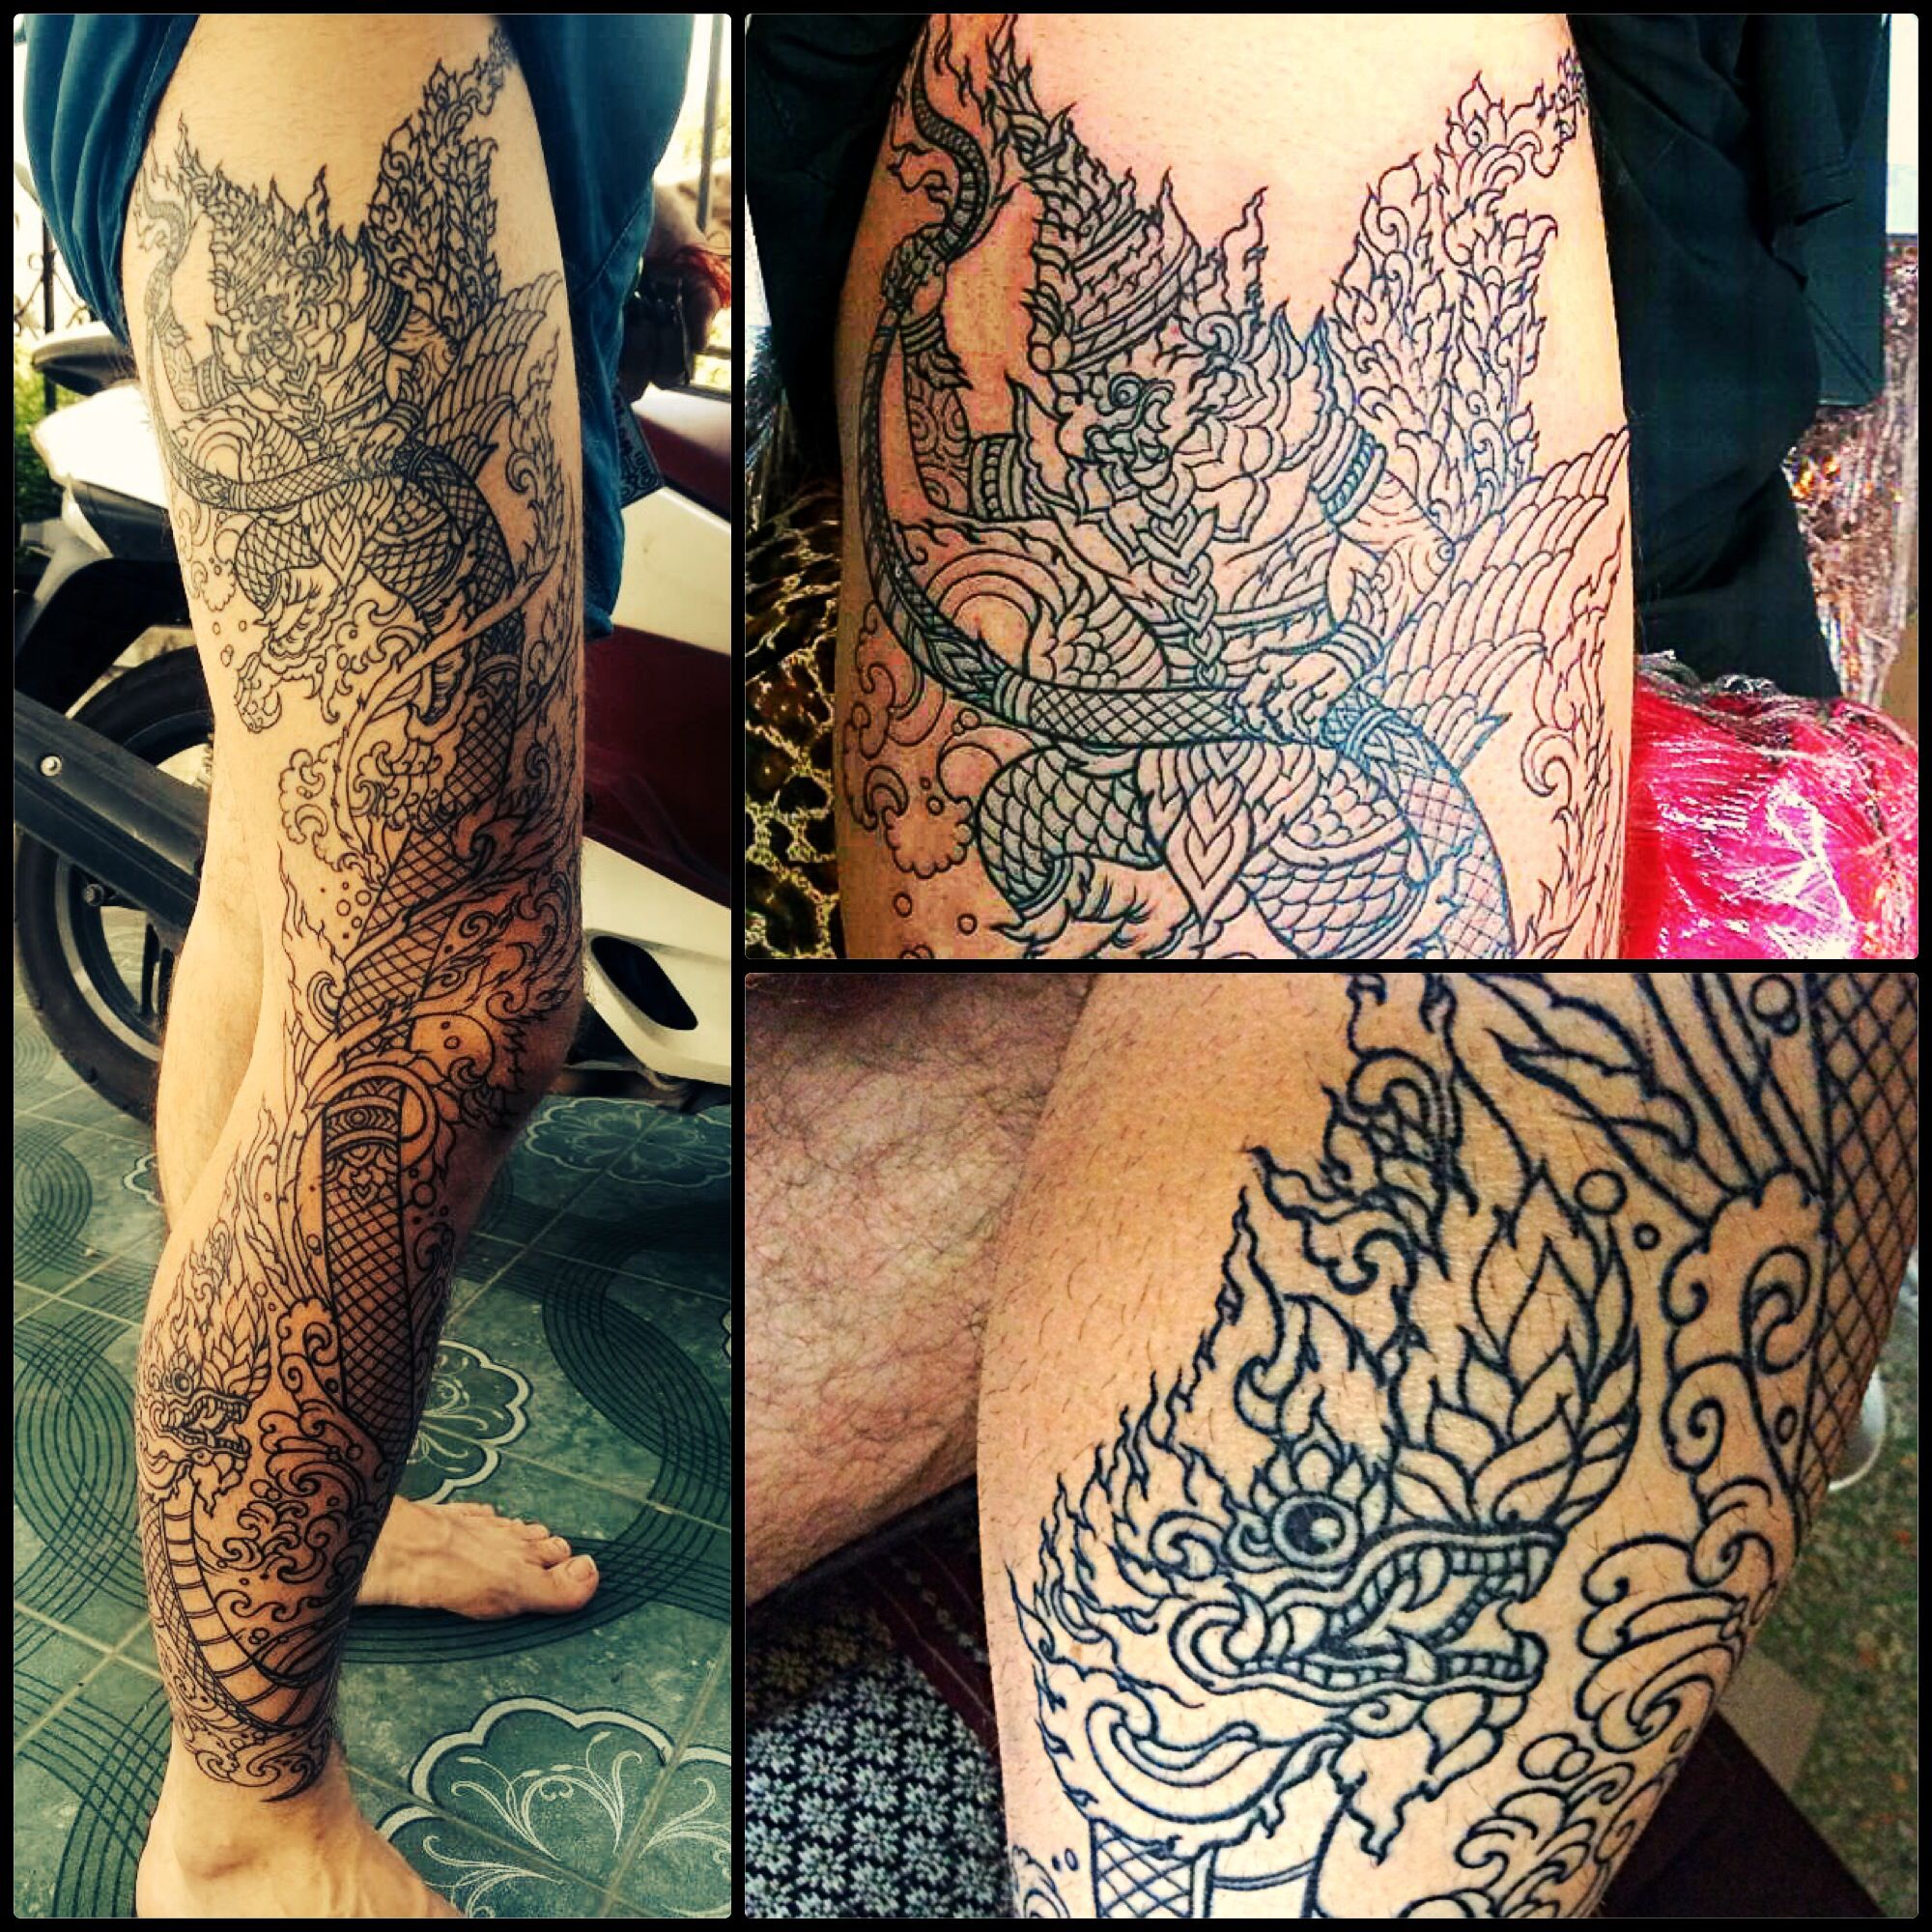 Thai Style Tattoo Naga And Garuda Full Leg Tattoo Art Tattoos